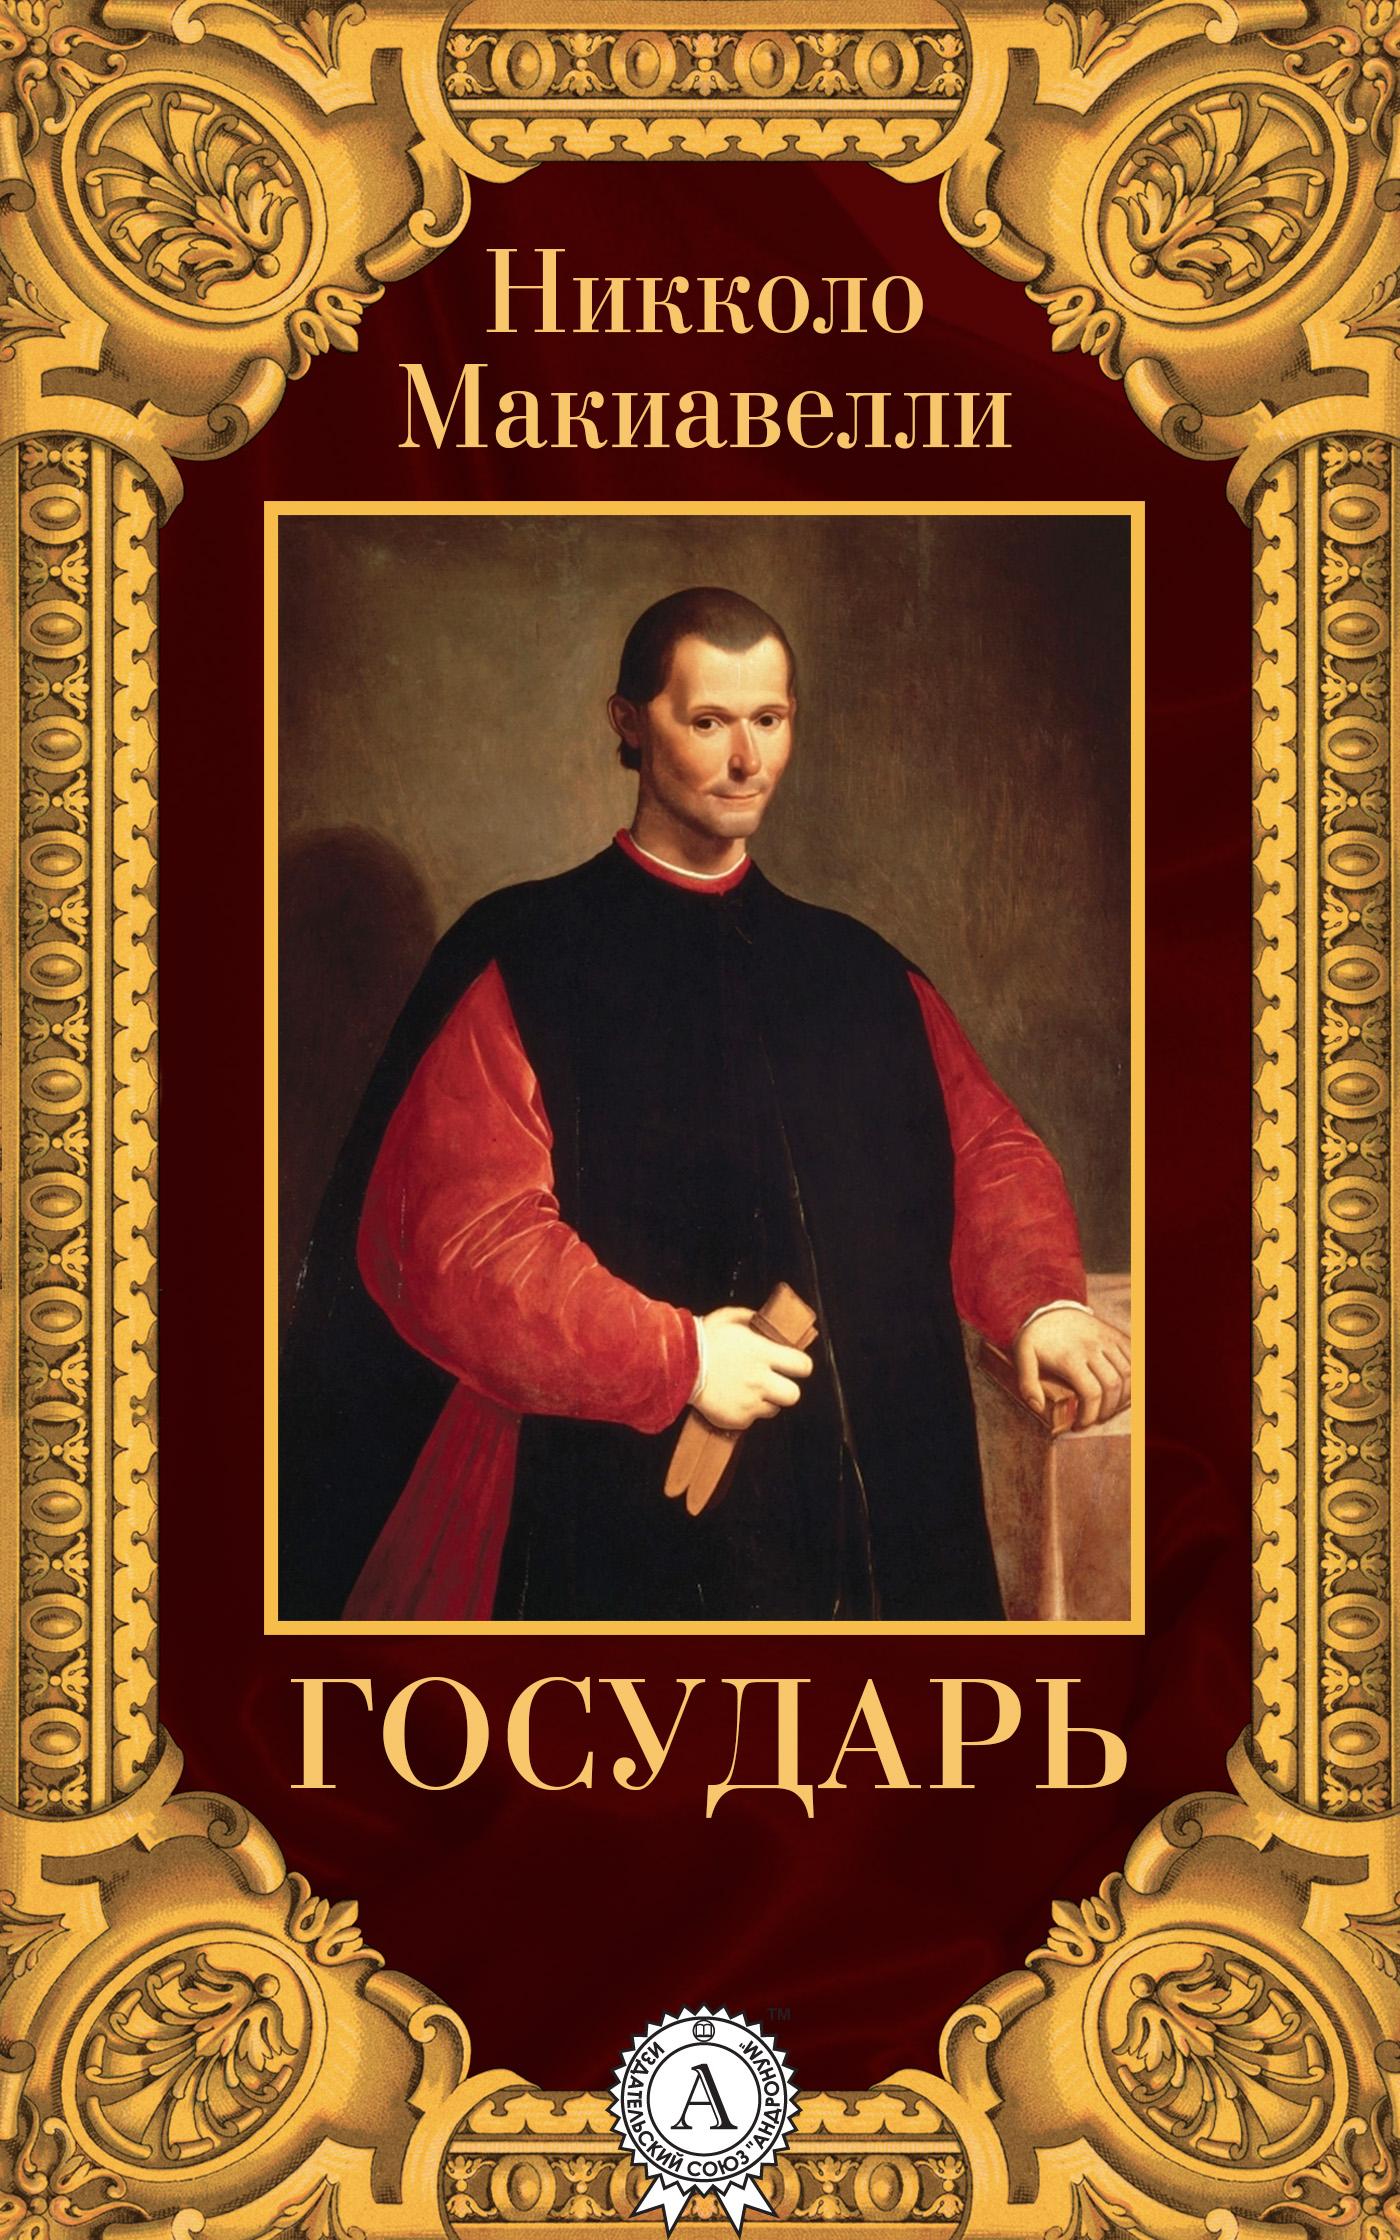 Нікколо Макіавеллі Государь